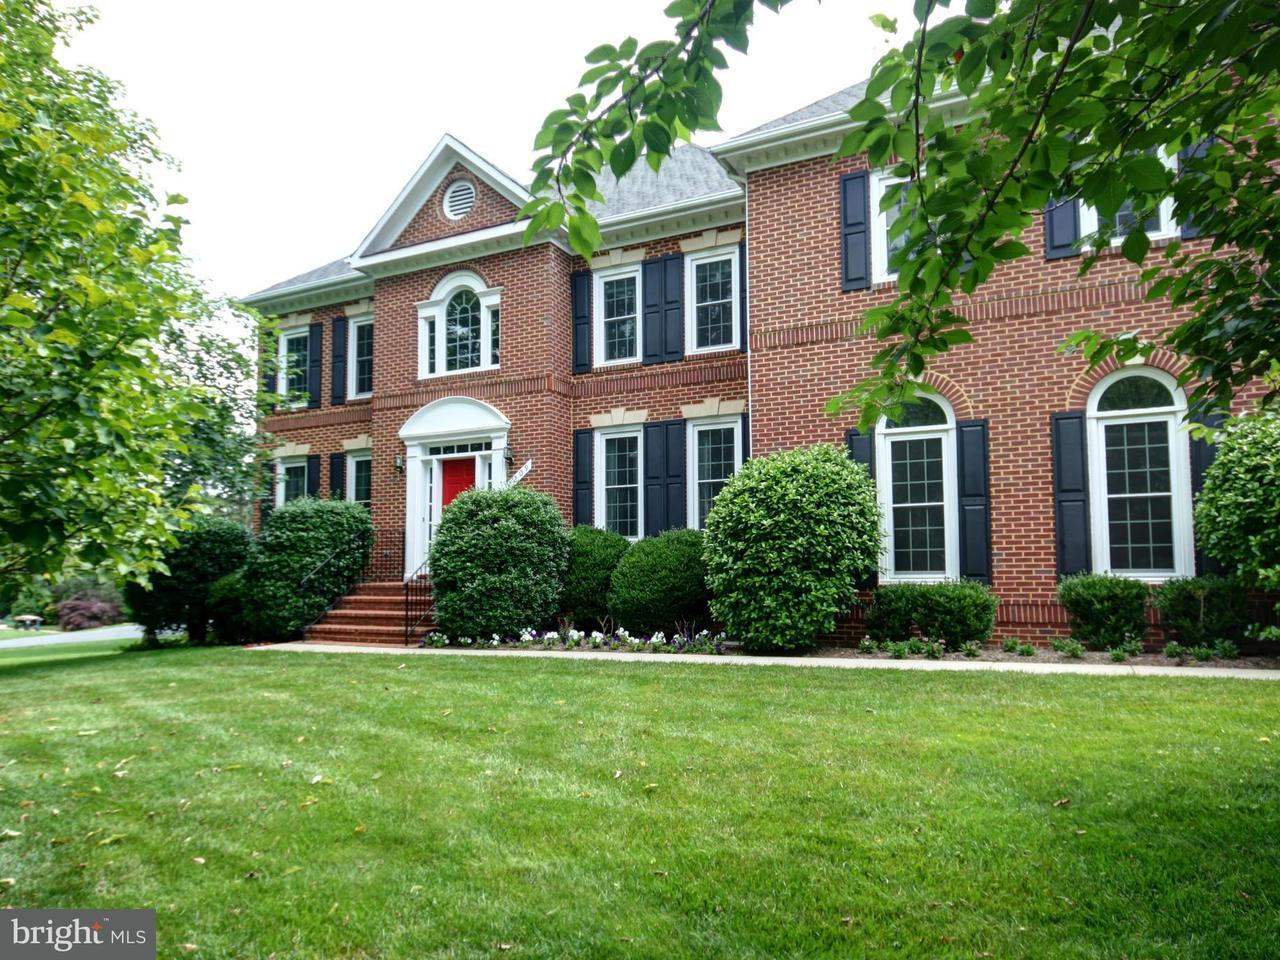 Single Family Home for Sale at 1209 Tottenham Court 1209 Tottenham Court Reston, Virginia 20194 United States